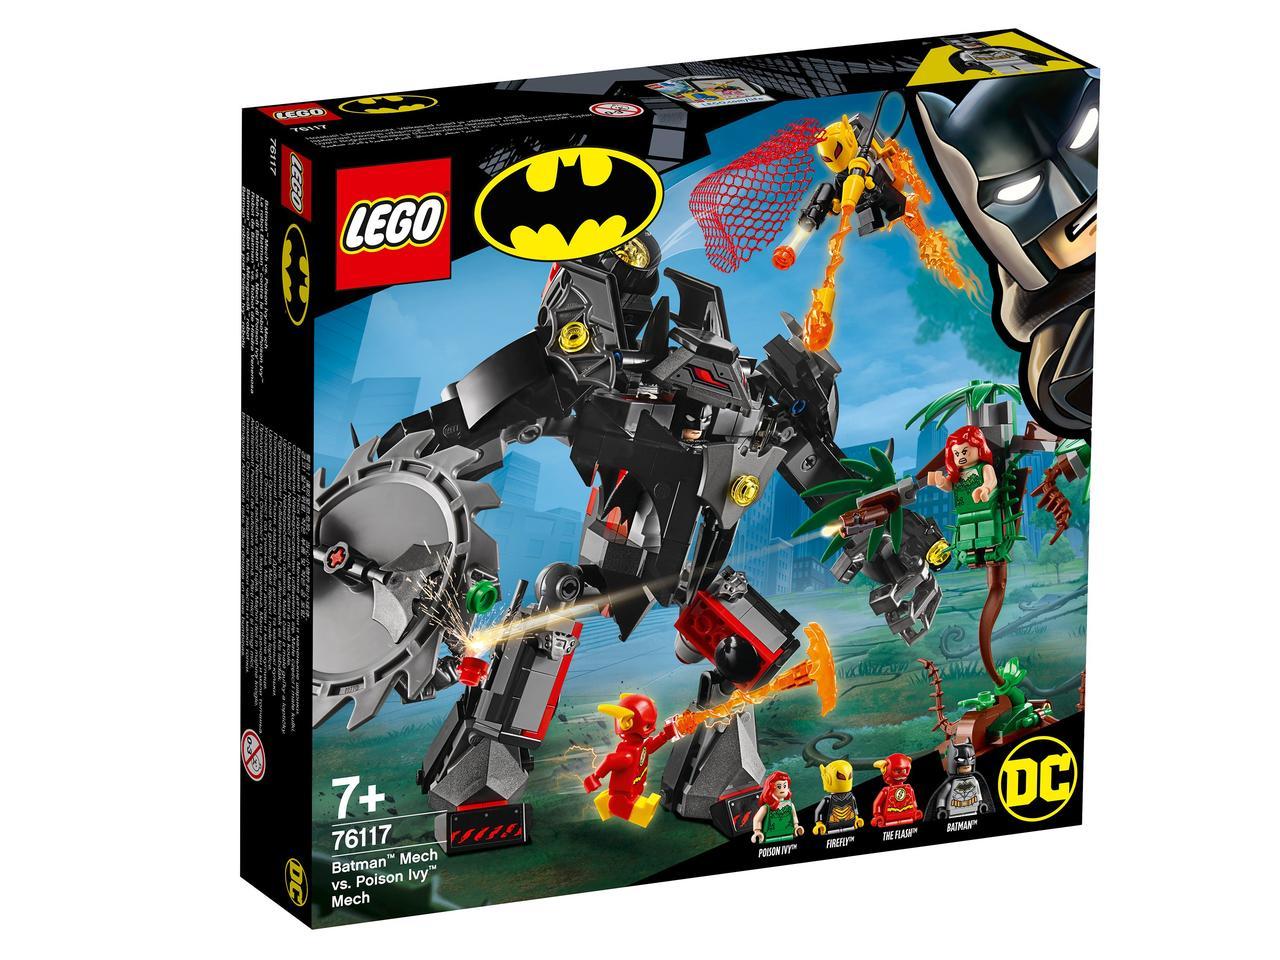 76117 Lego Super Heroes Робот Бэтмена против робота Ядовитого Плюща™, Лего Супергерои DC